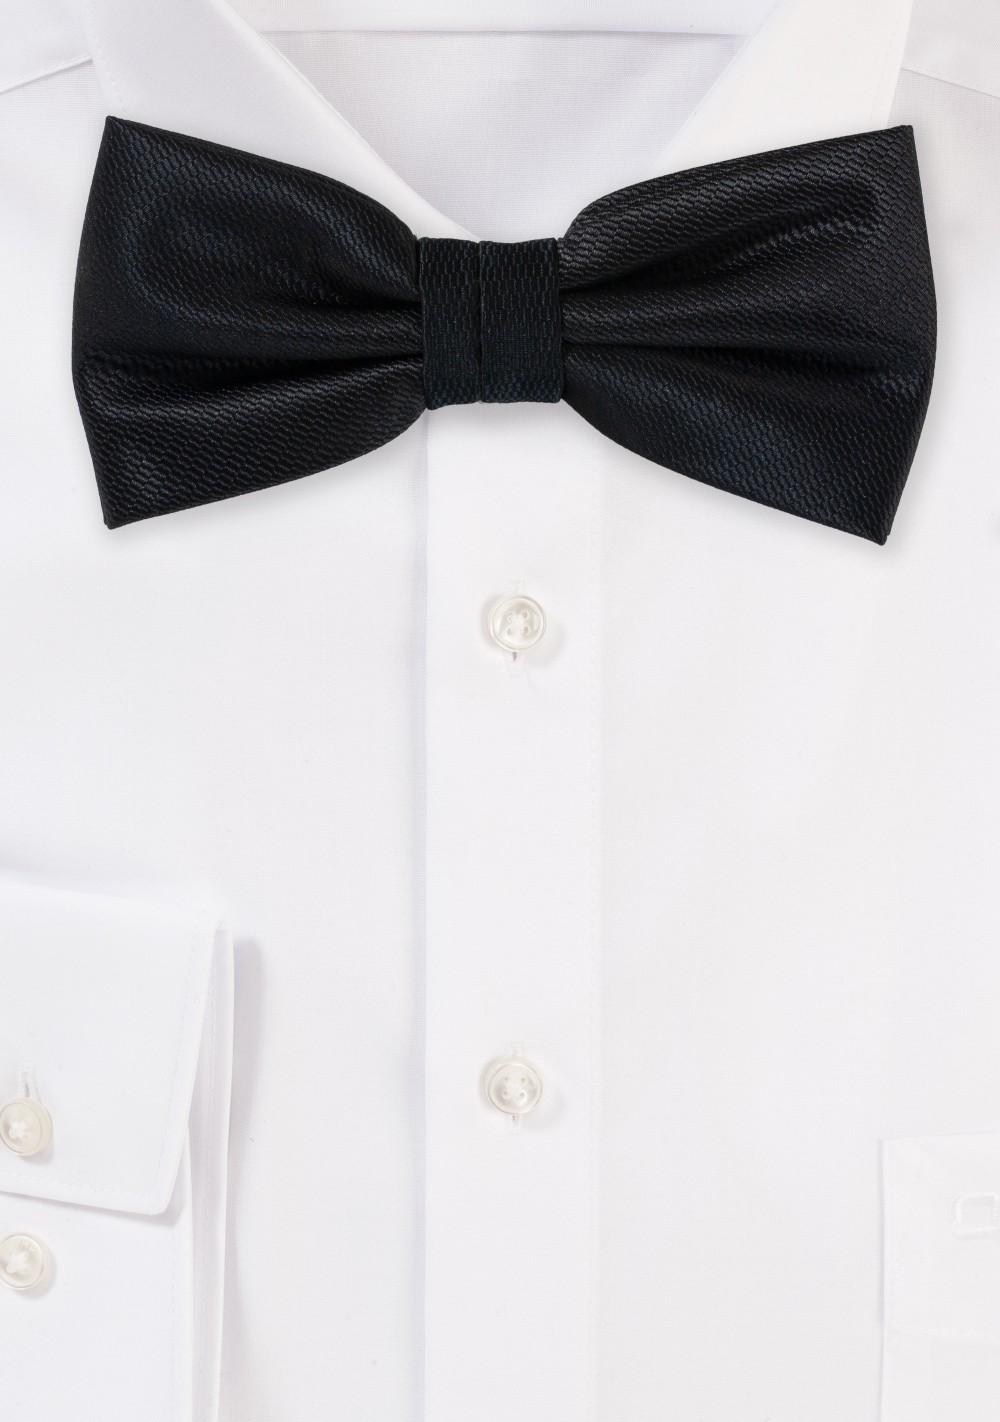 Formal Black Textured Bow Tie